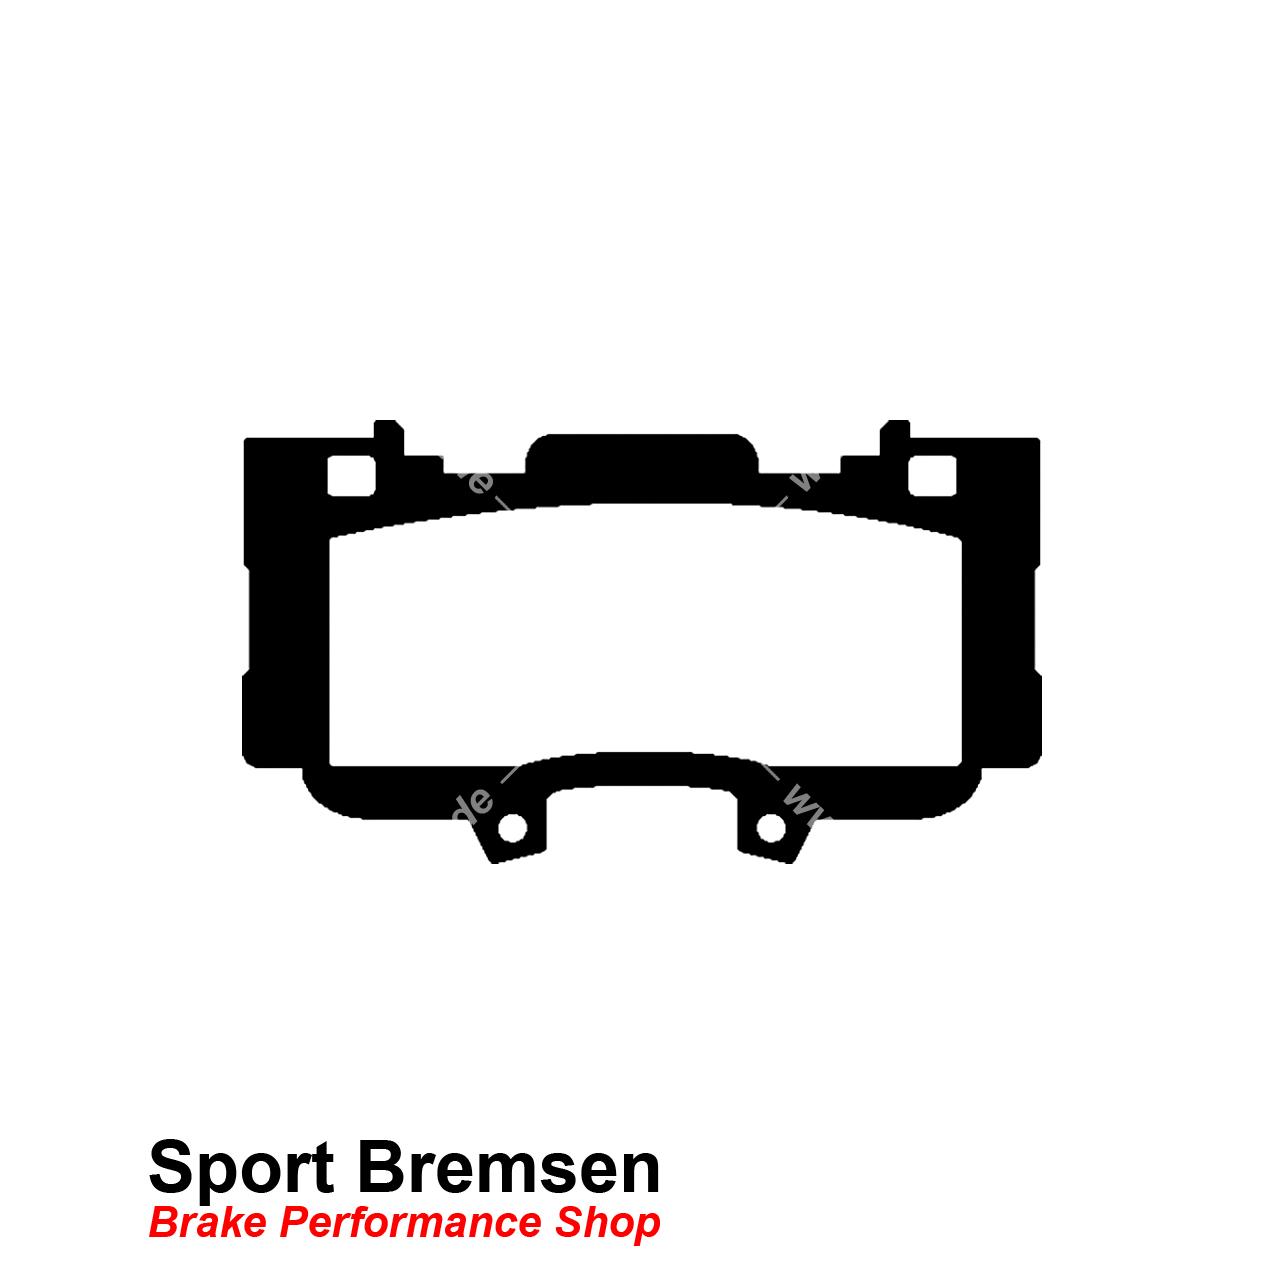 Ebc Yellowstuff Bremsbelage Fur Ford Mustang 6